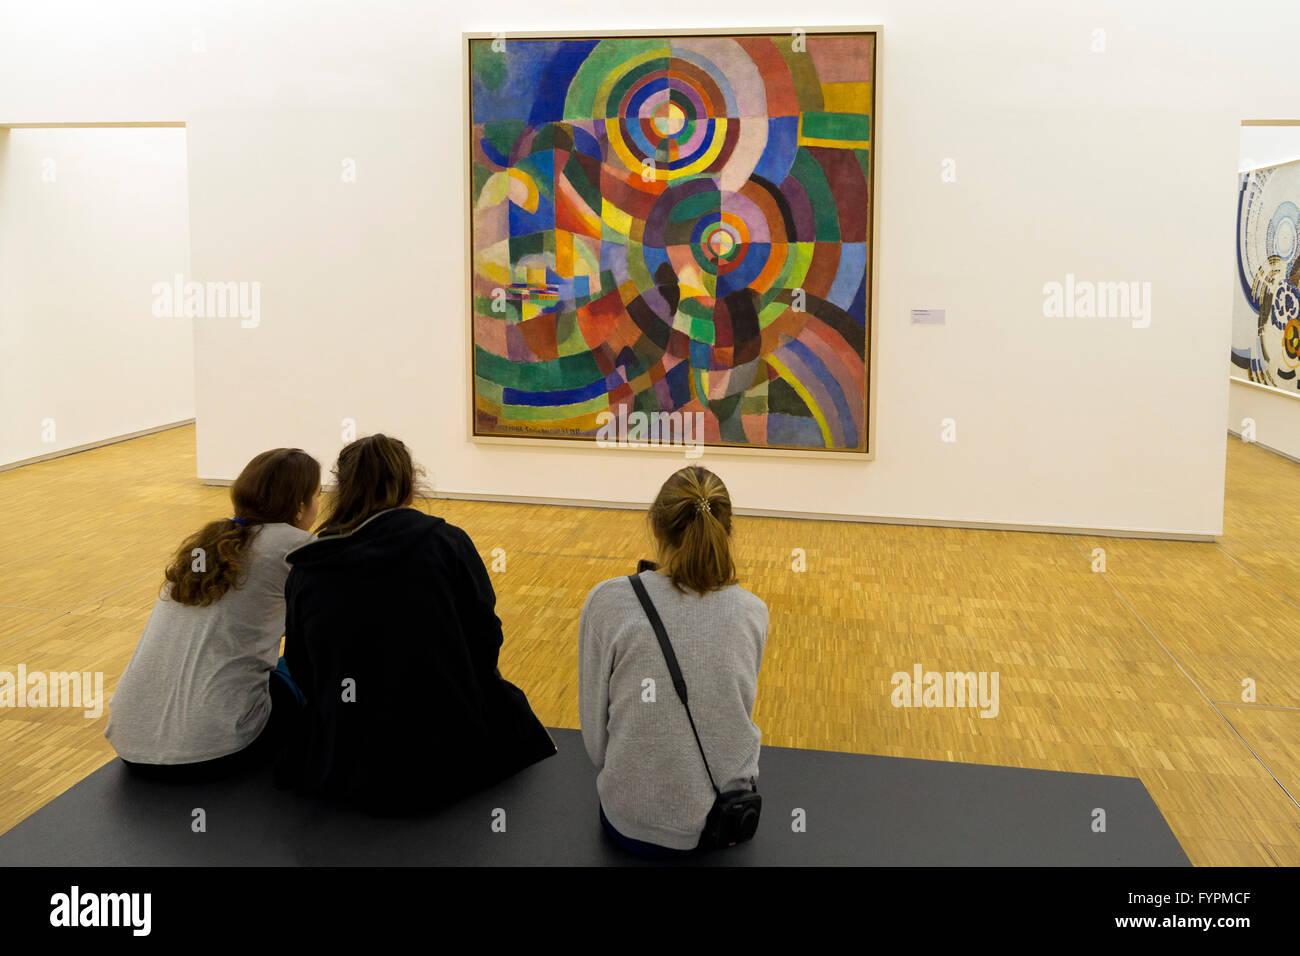 Young girls study Electric Prisms, Prismes electriques,  by Sonia Delauney 1914, Centre Pompidou, Paris, France, - Stock Image